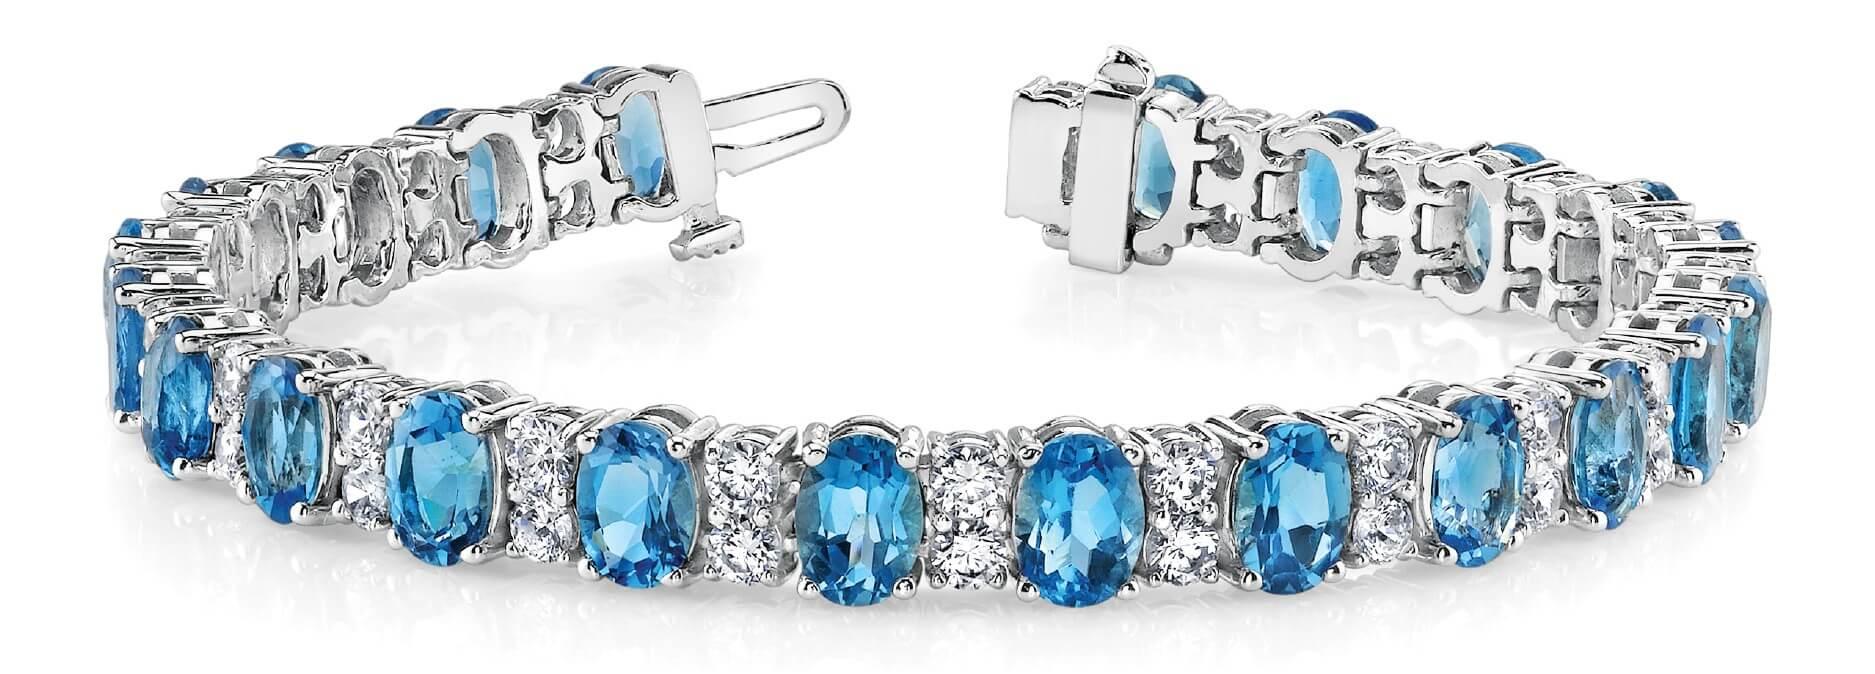 Oval Blue Topaz Diamond Tennis Bracelet